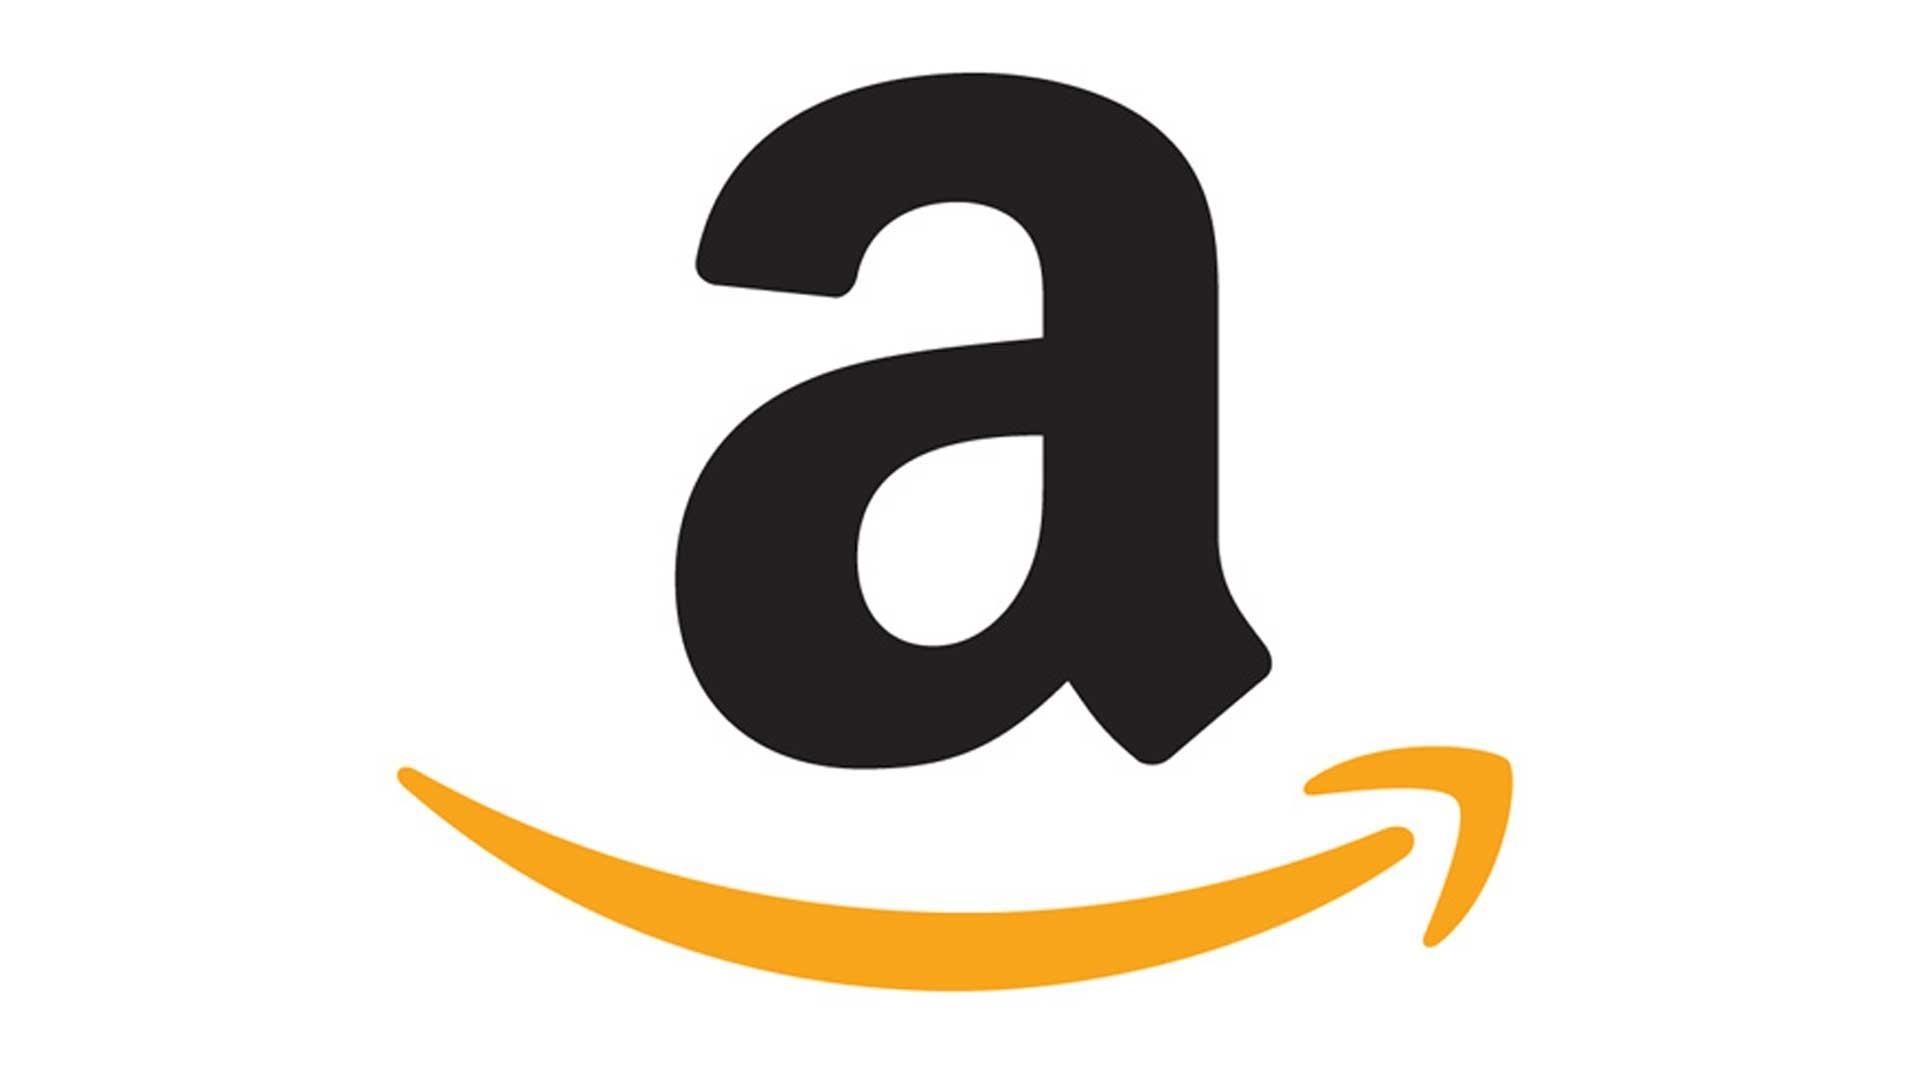 1920x1080-brands-amazon-logo.jpg